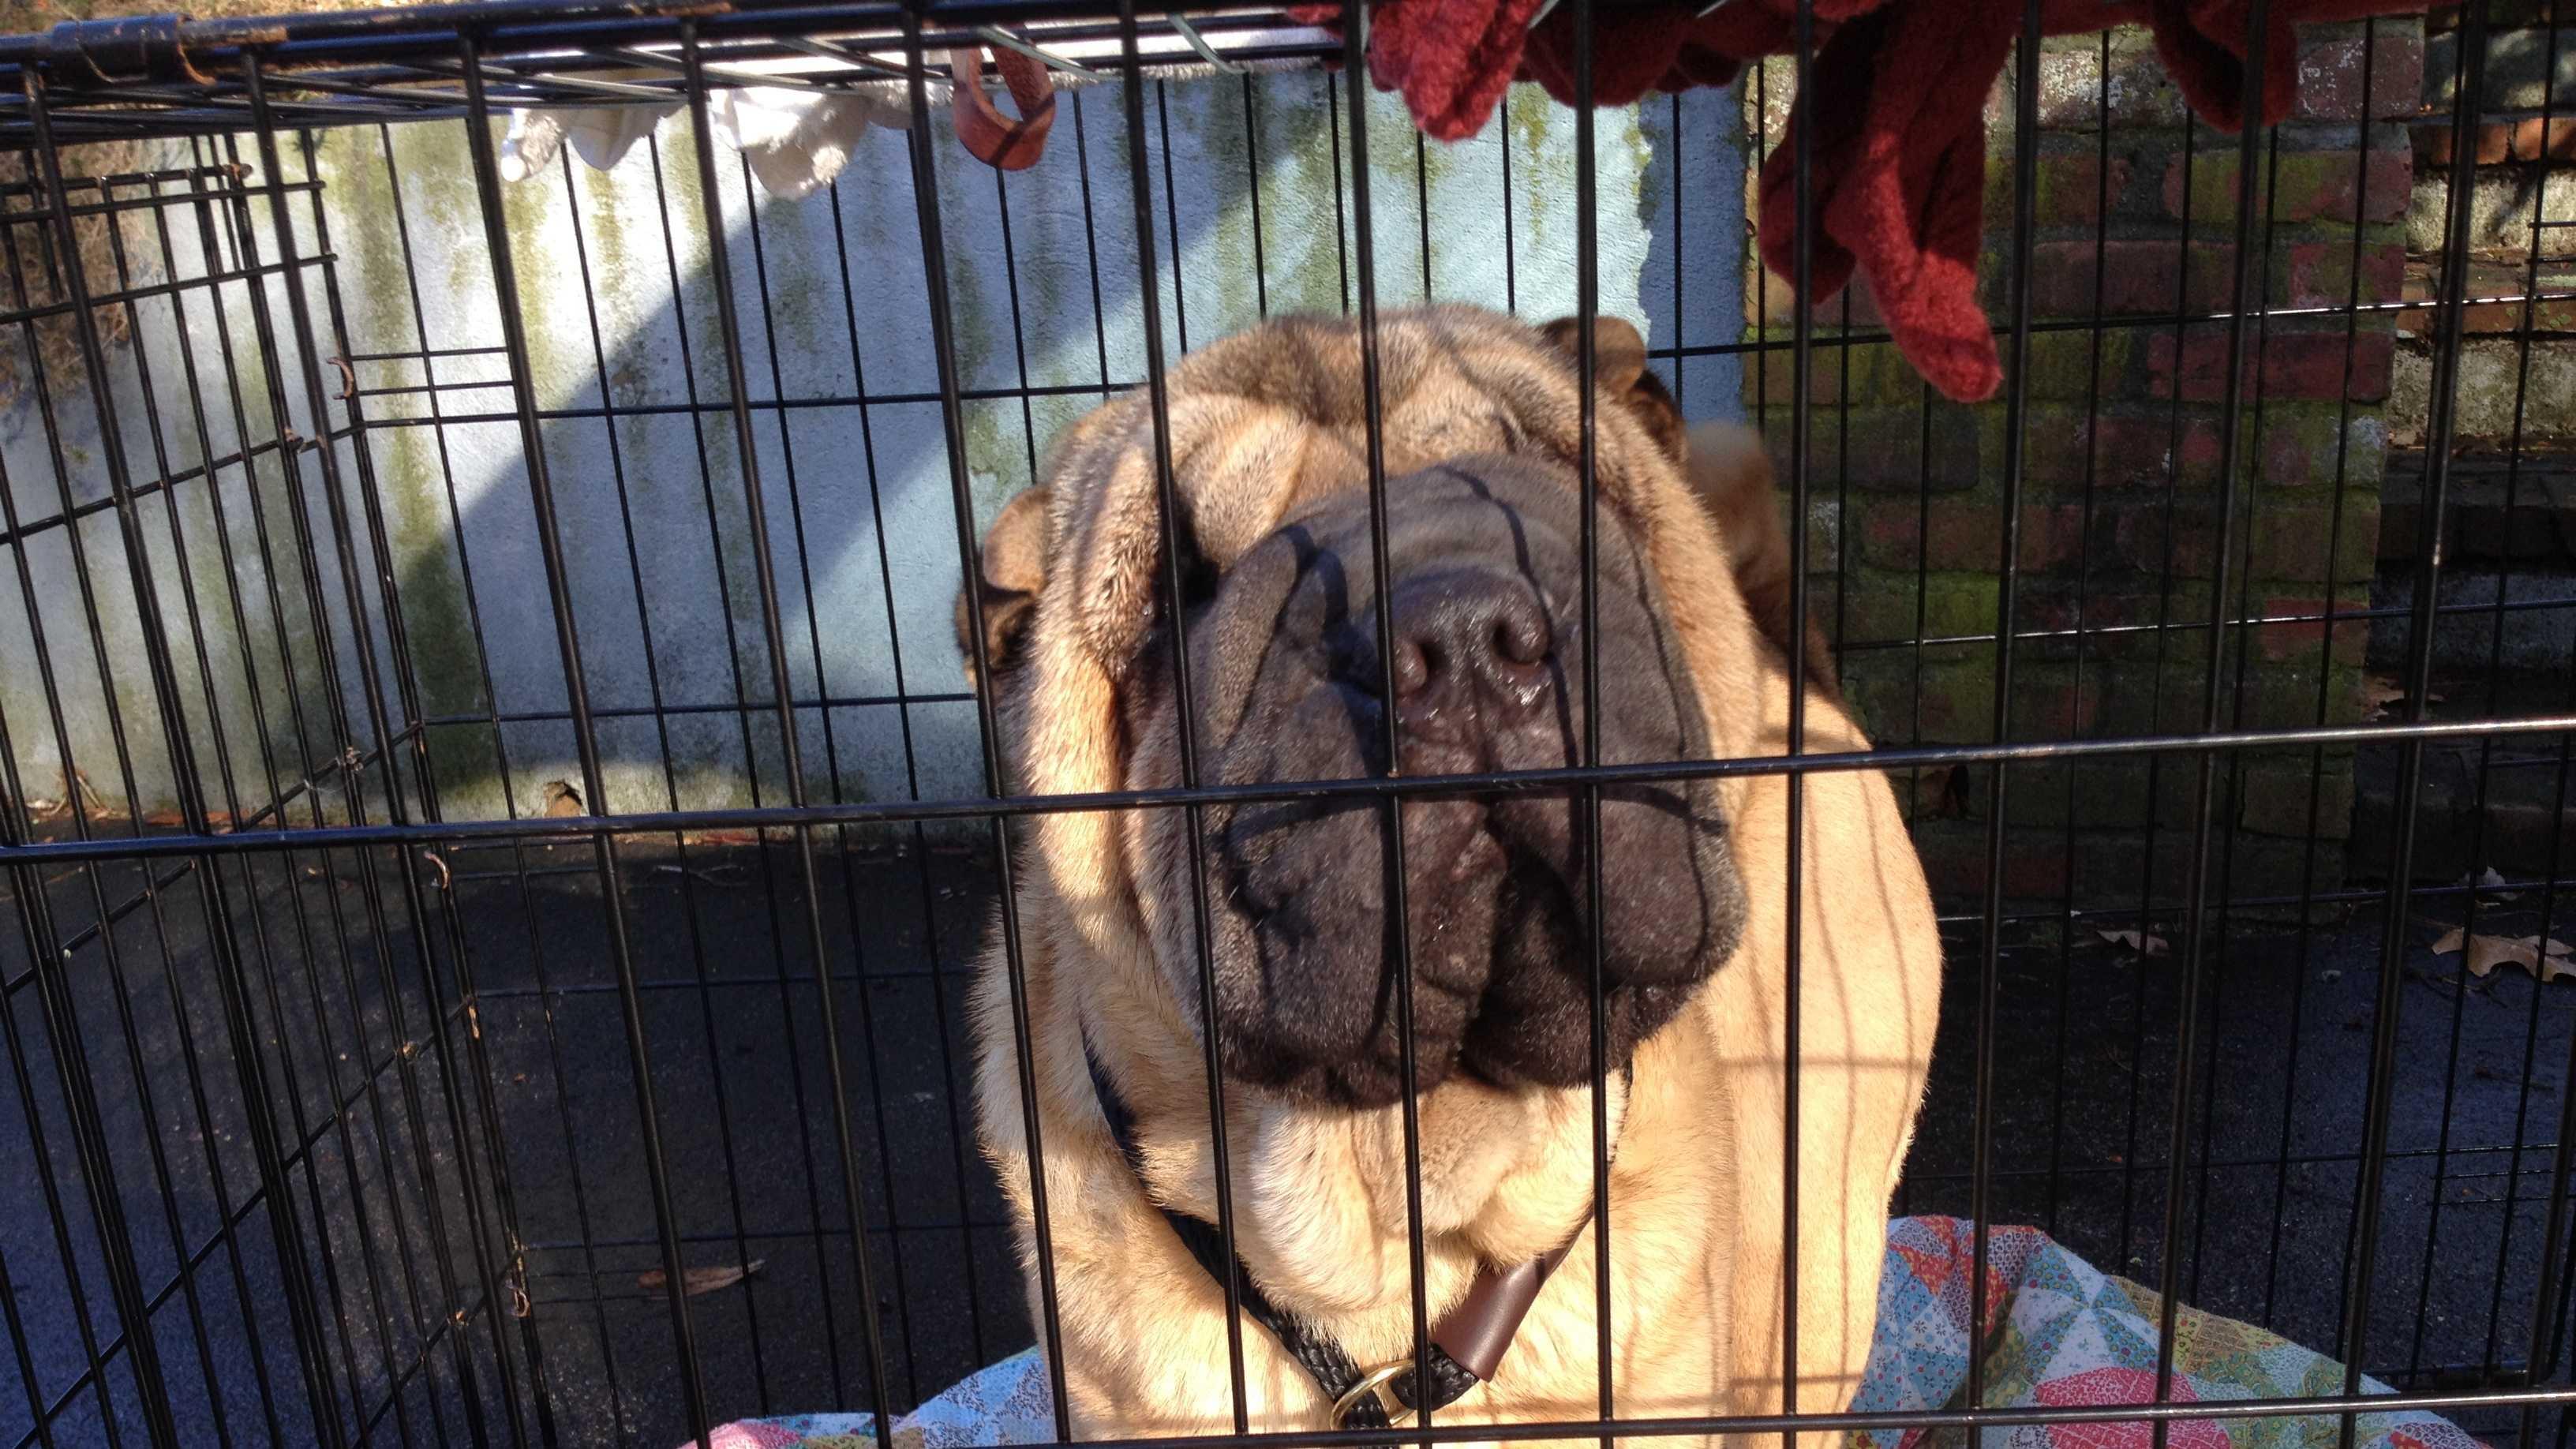 Dog rescued in Braintree